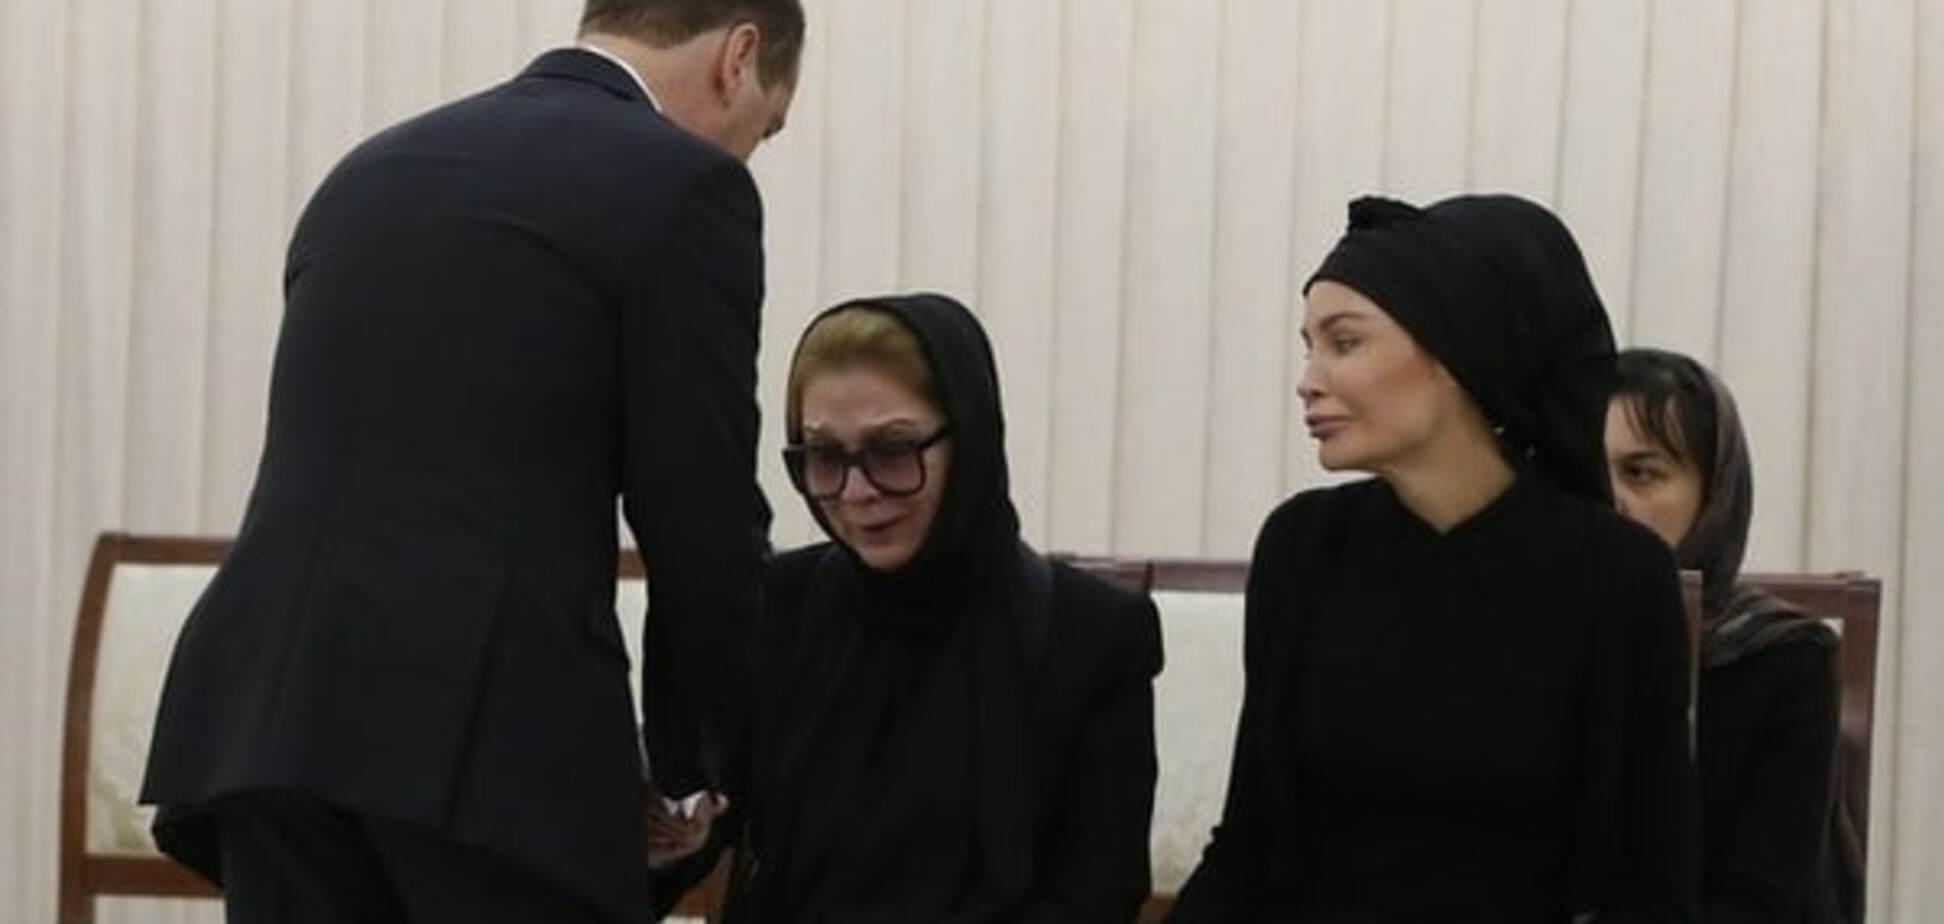 Жена Ислама Каримова Татьяна и младшая дочь Лола